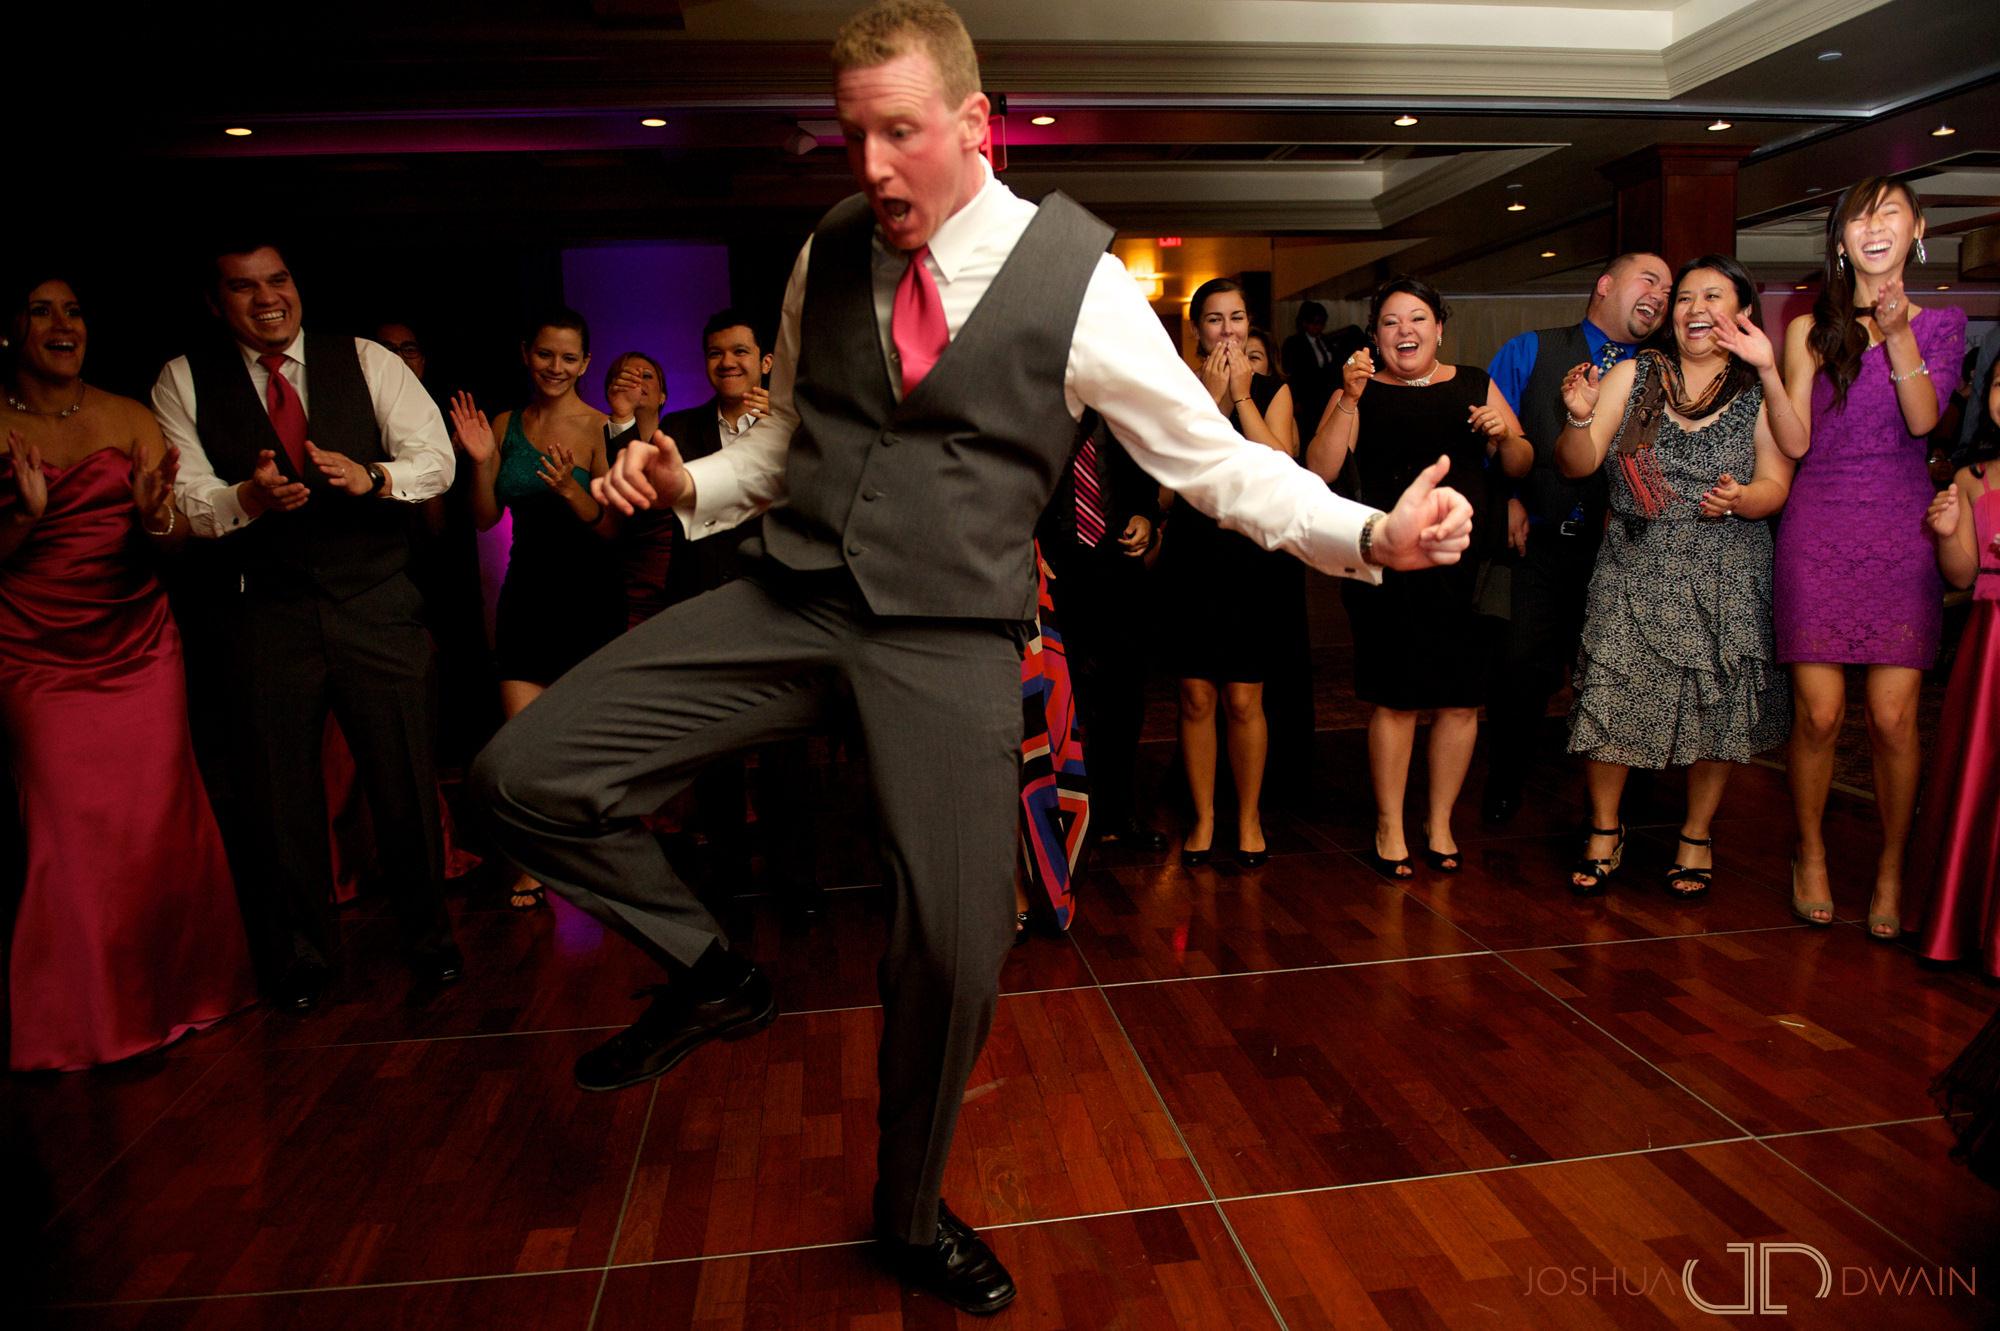 danielle-derek-020-the-imperia-somerset-new-jersey-wedding-photographer-joshua-dwain-danielle-derek-030-the-imperia-somerset-new-jerseywedding-photographer-joshua-dwain-2012-09-15_dd_563